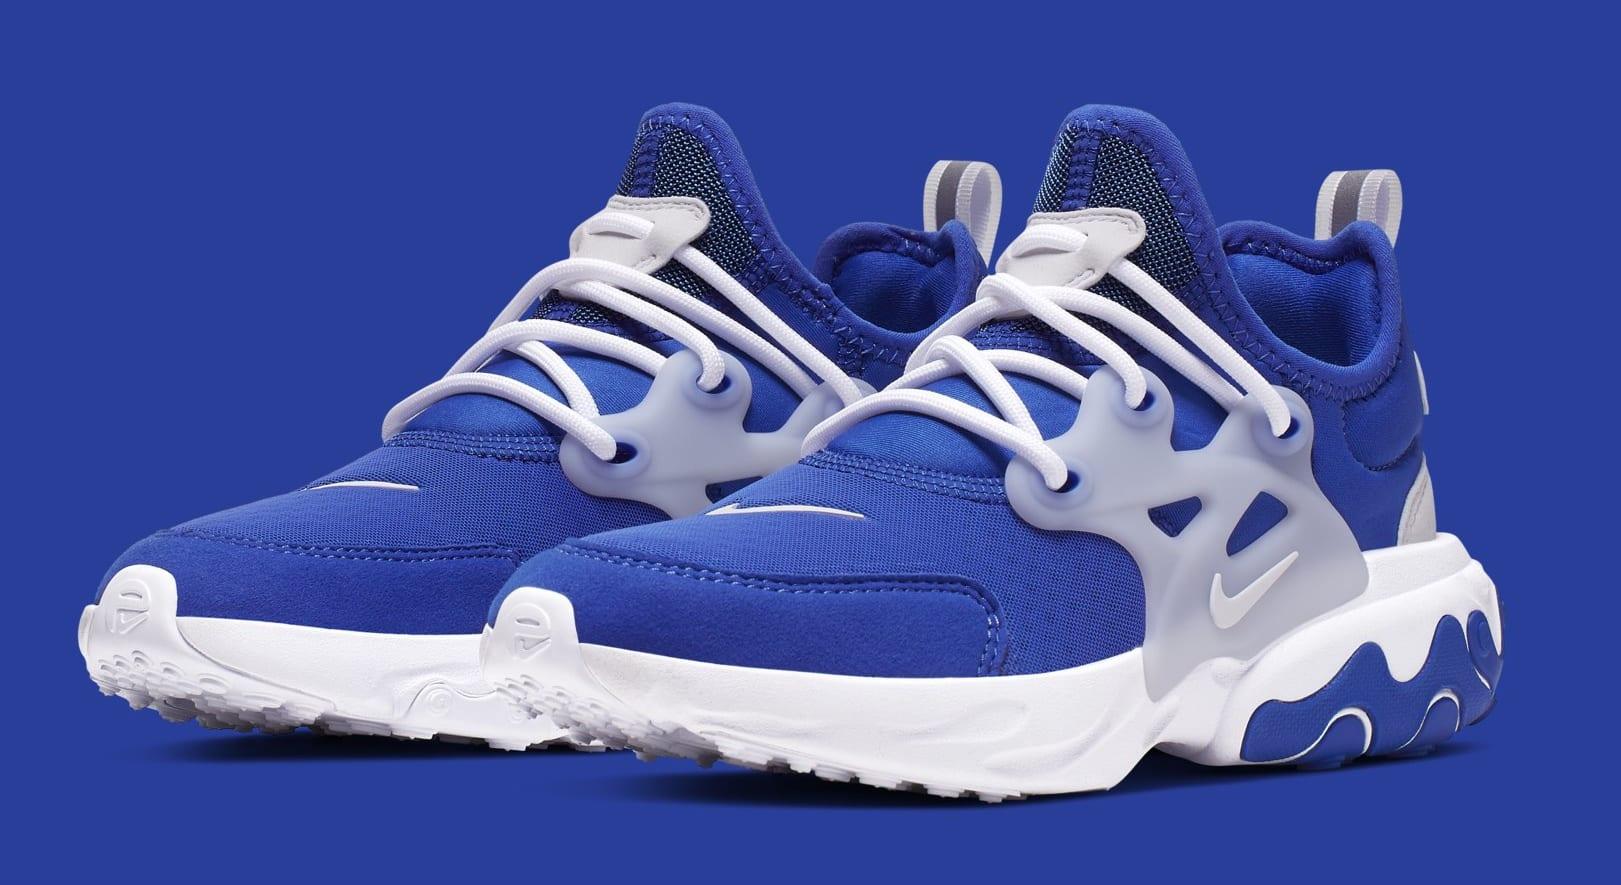 Nike Presto React BQ4002-400 (Pair)